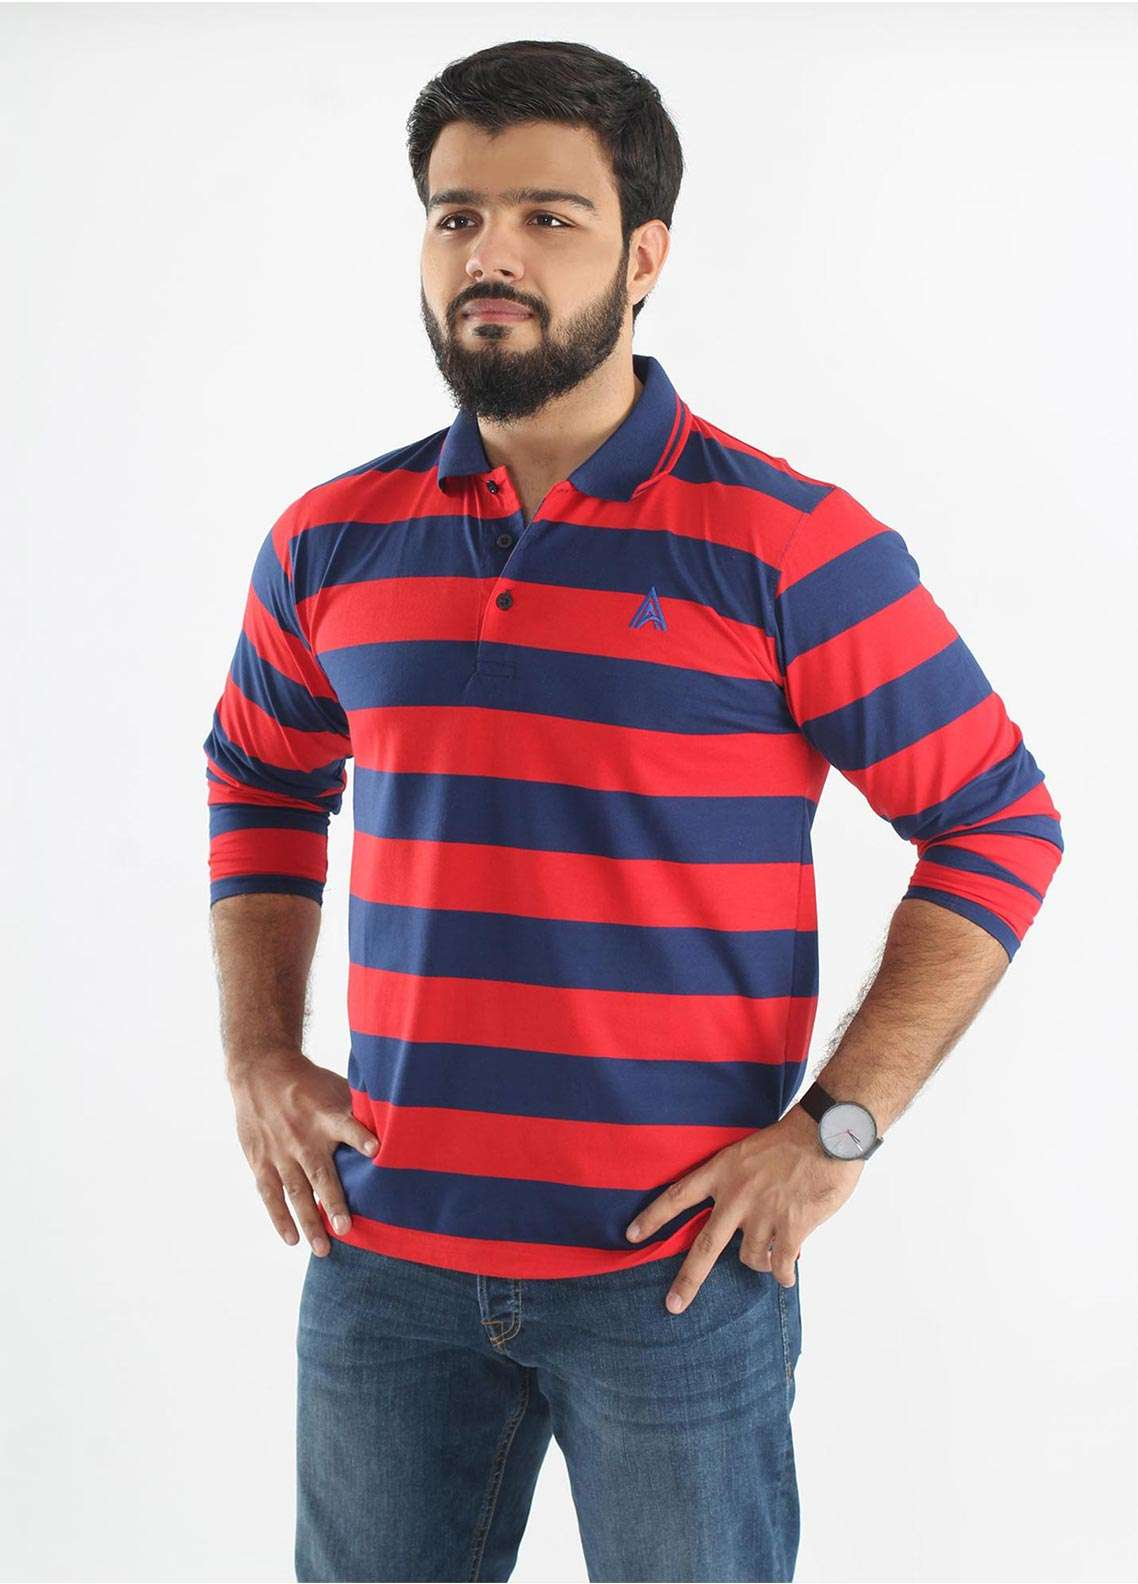 Anchor Jersey Polo Men T-Shirts - Multi A-214